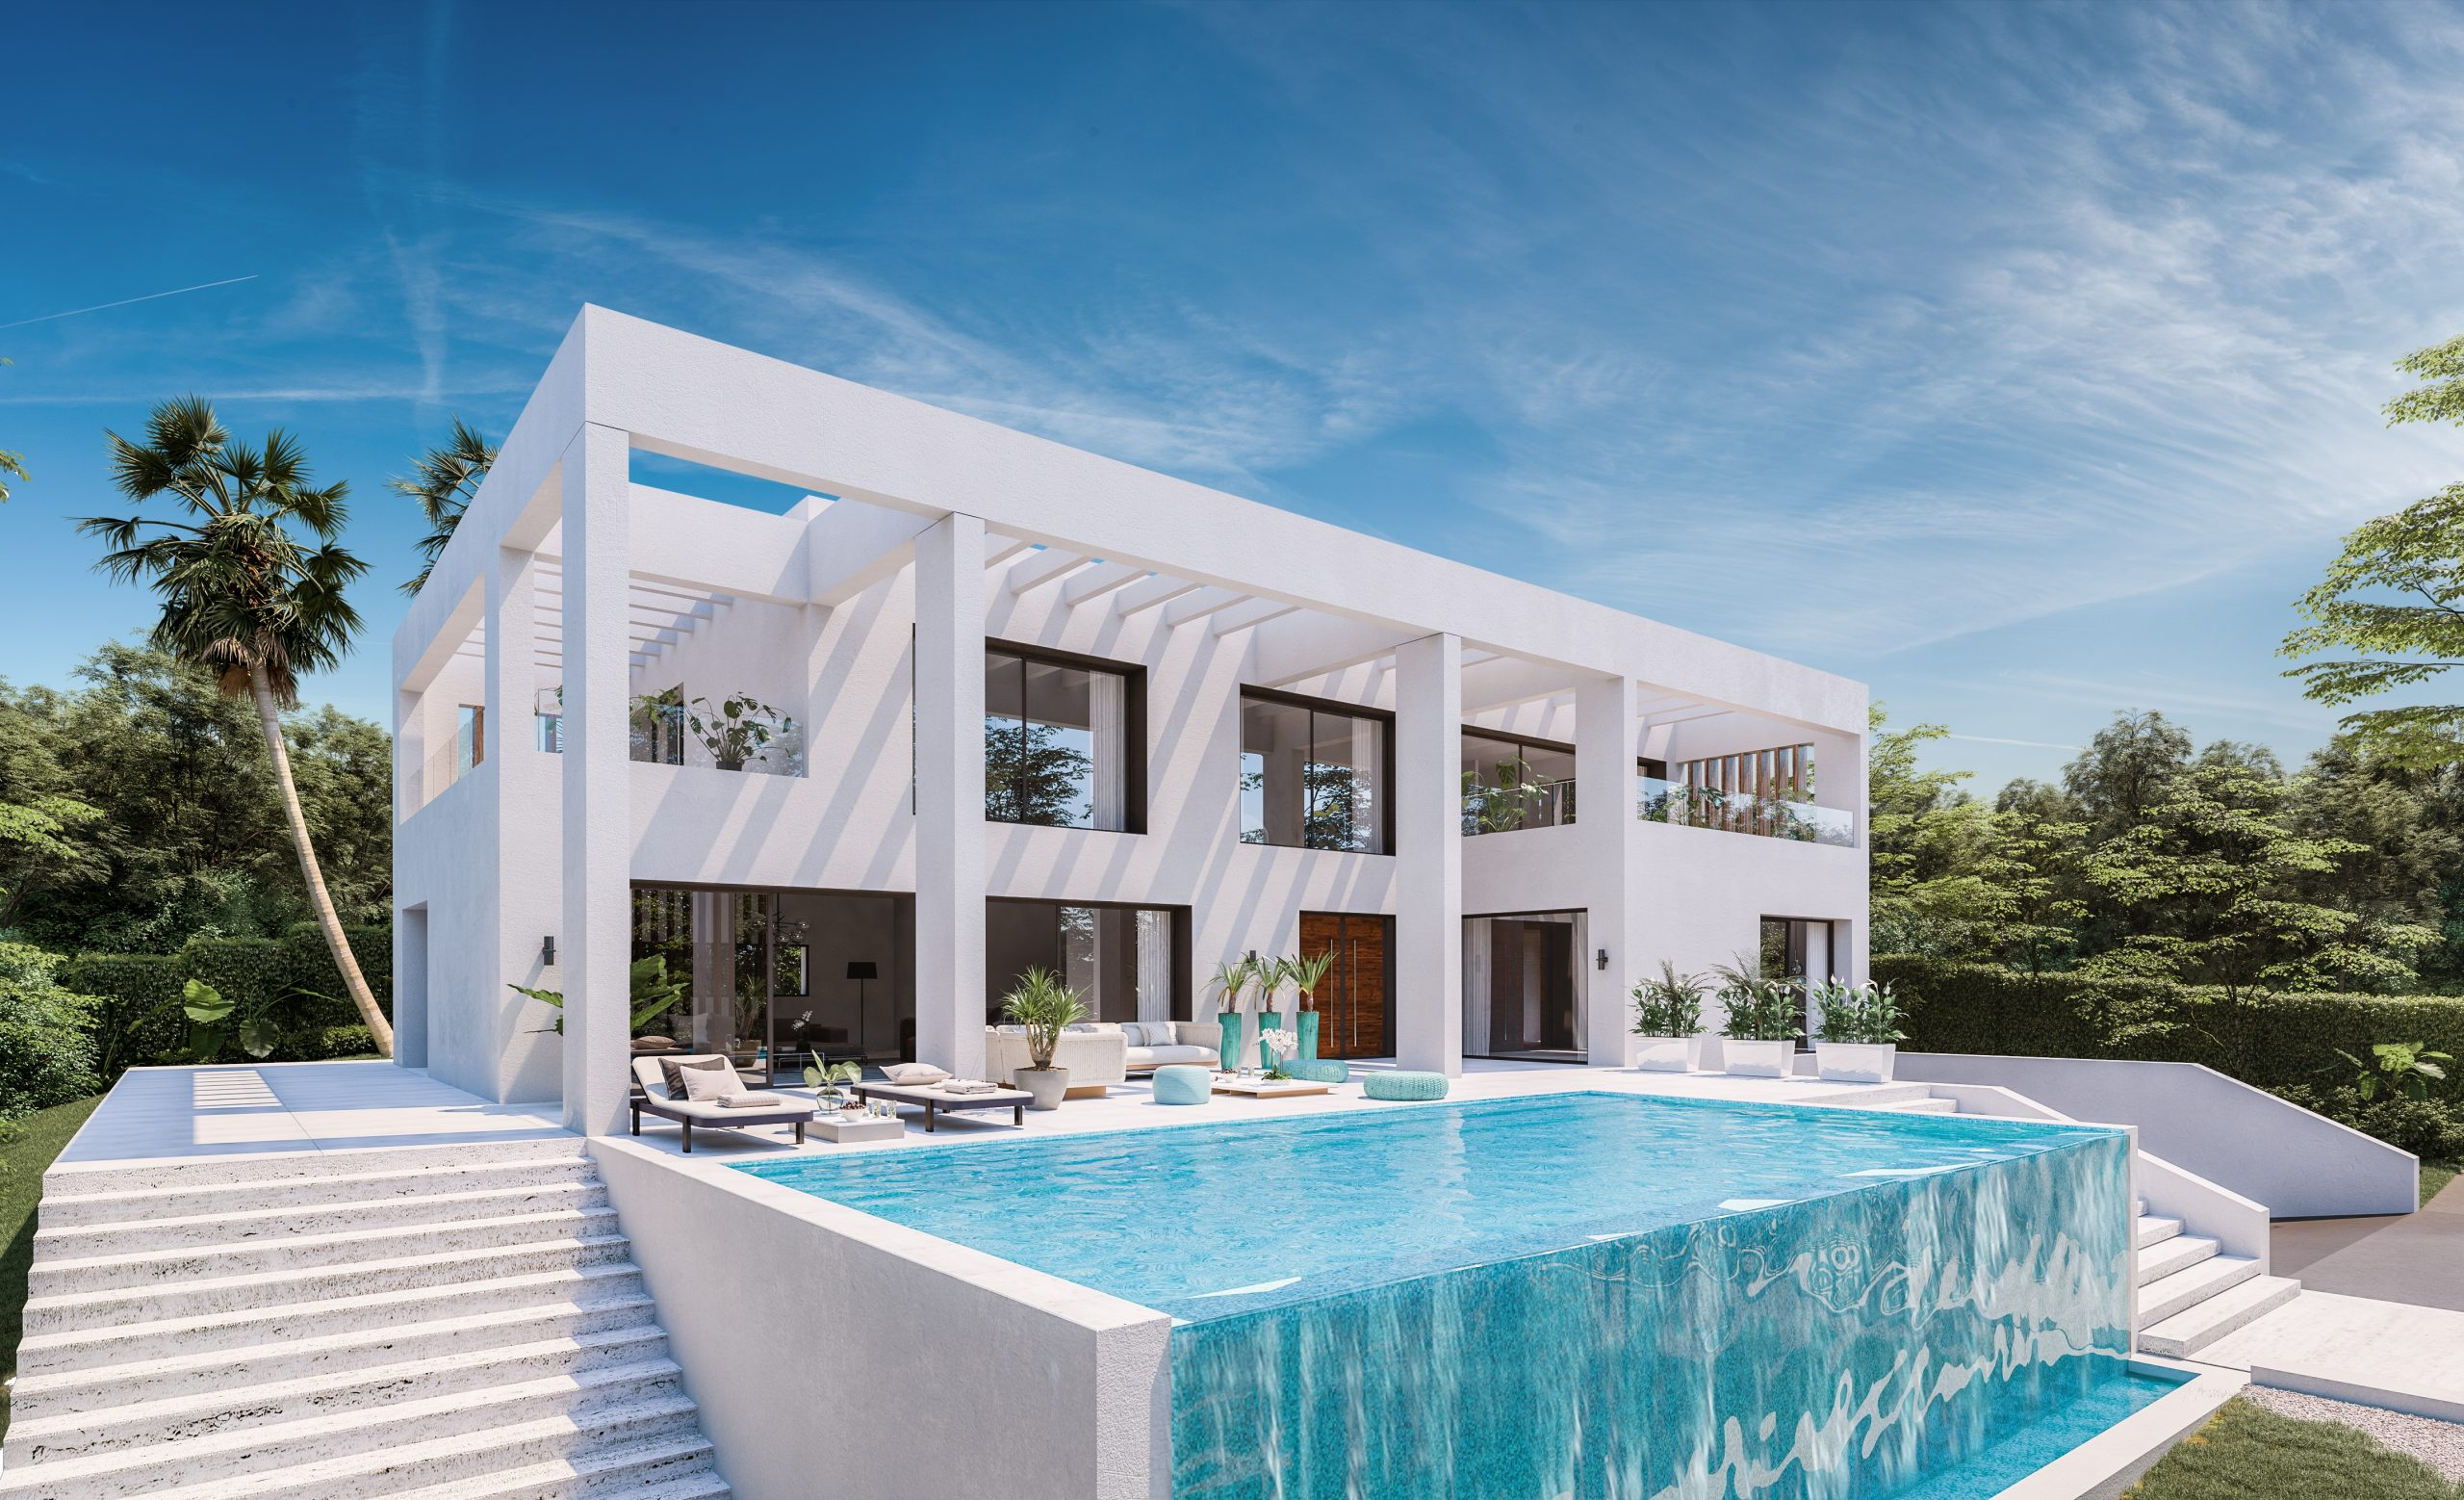 Benalmadena Immobilier-Swiss.ch Projet d'habitation modulaire en béton          